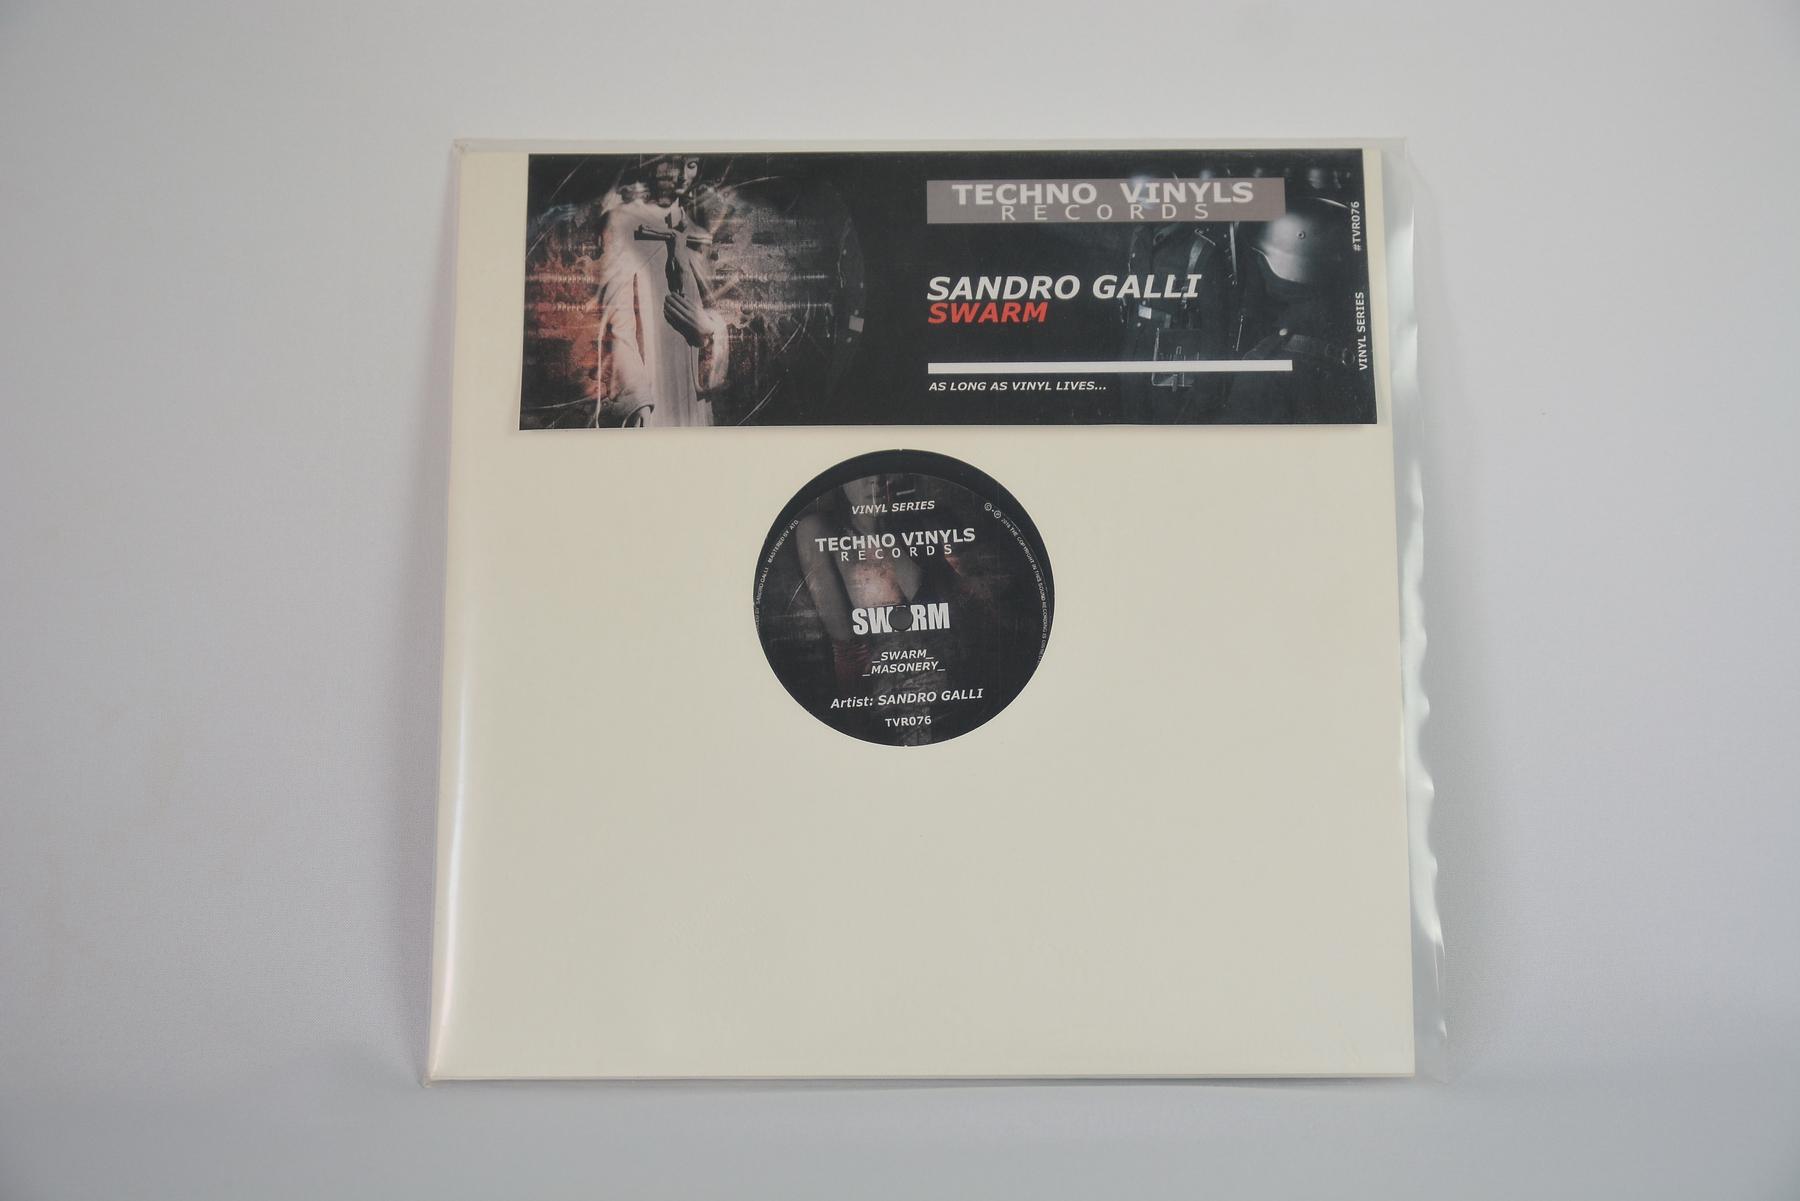 Sandro Galli – Swarm EP